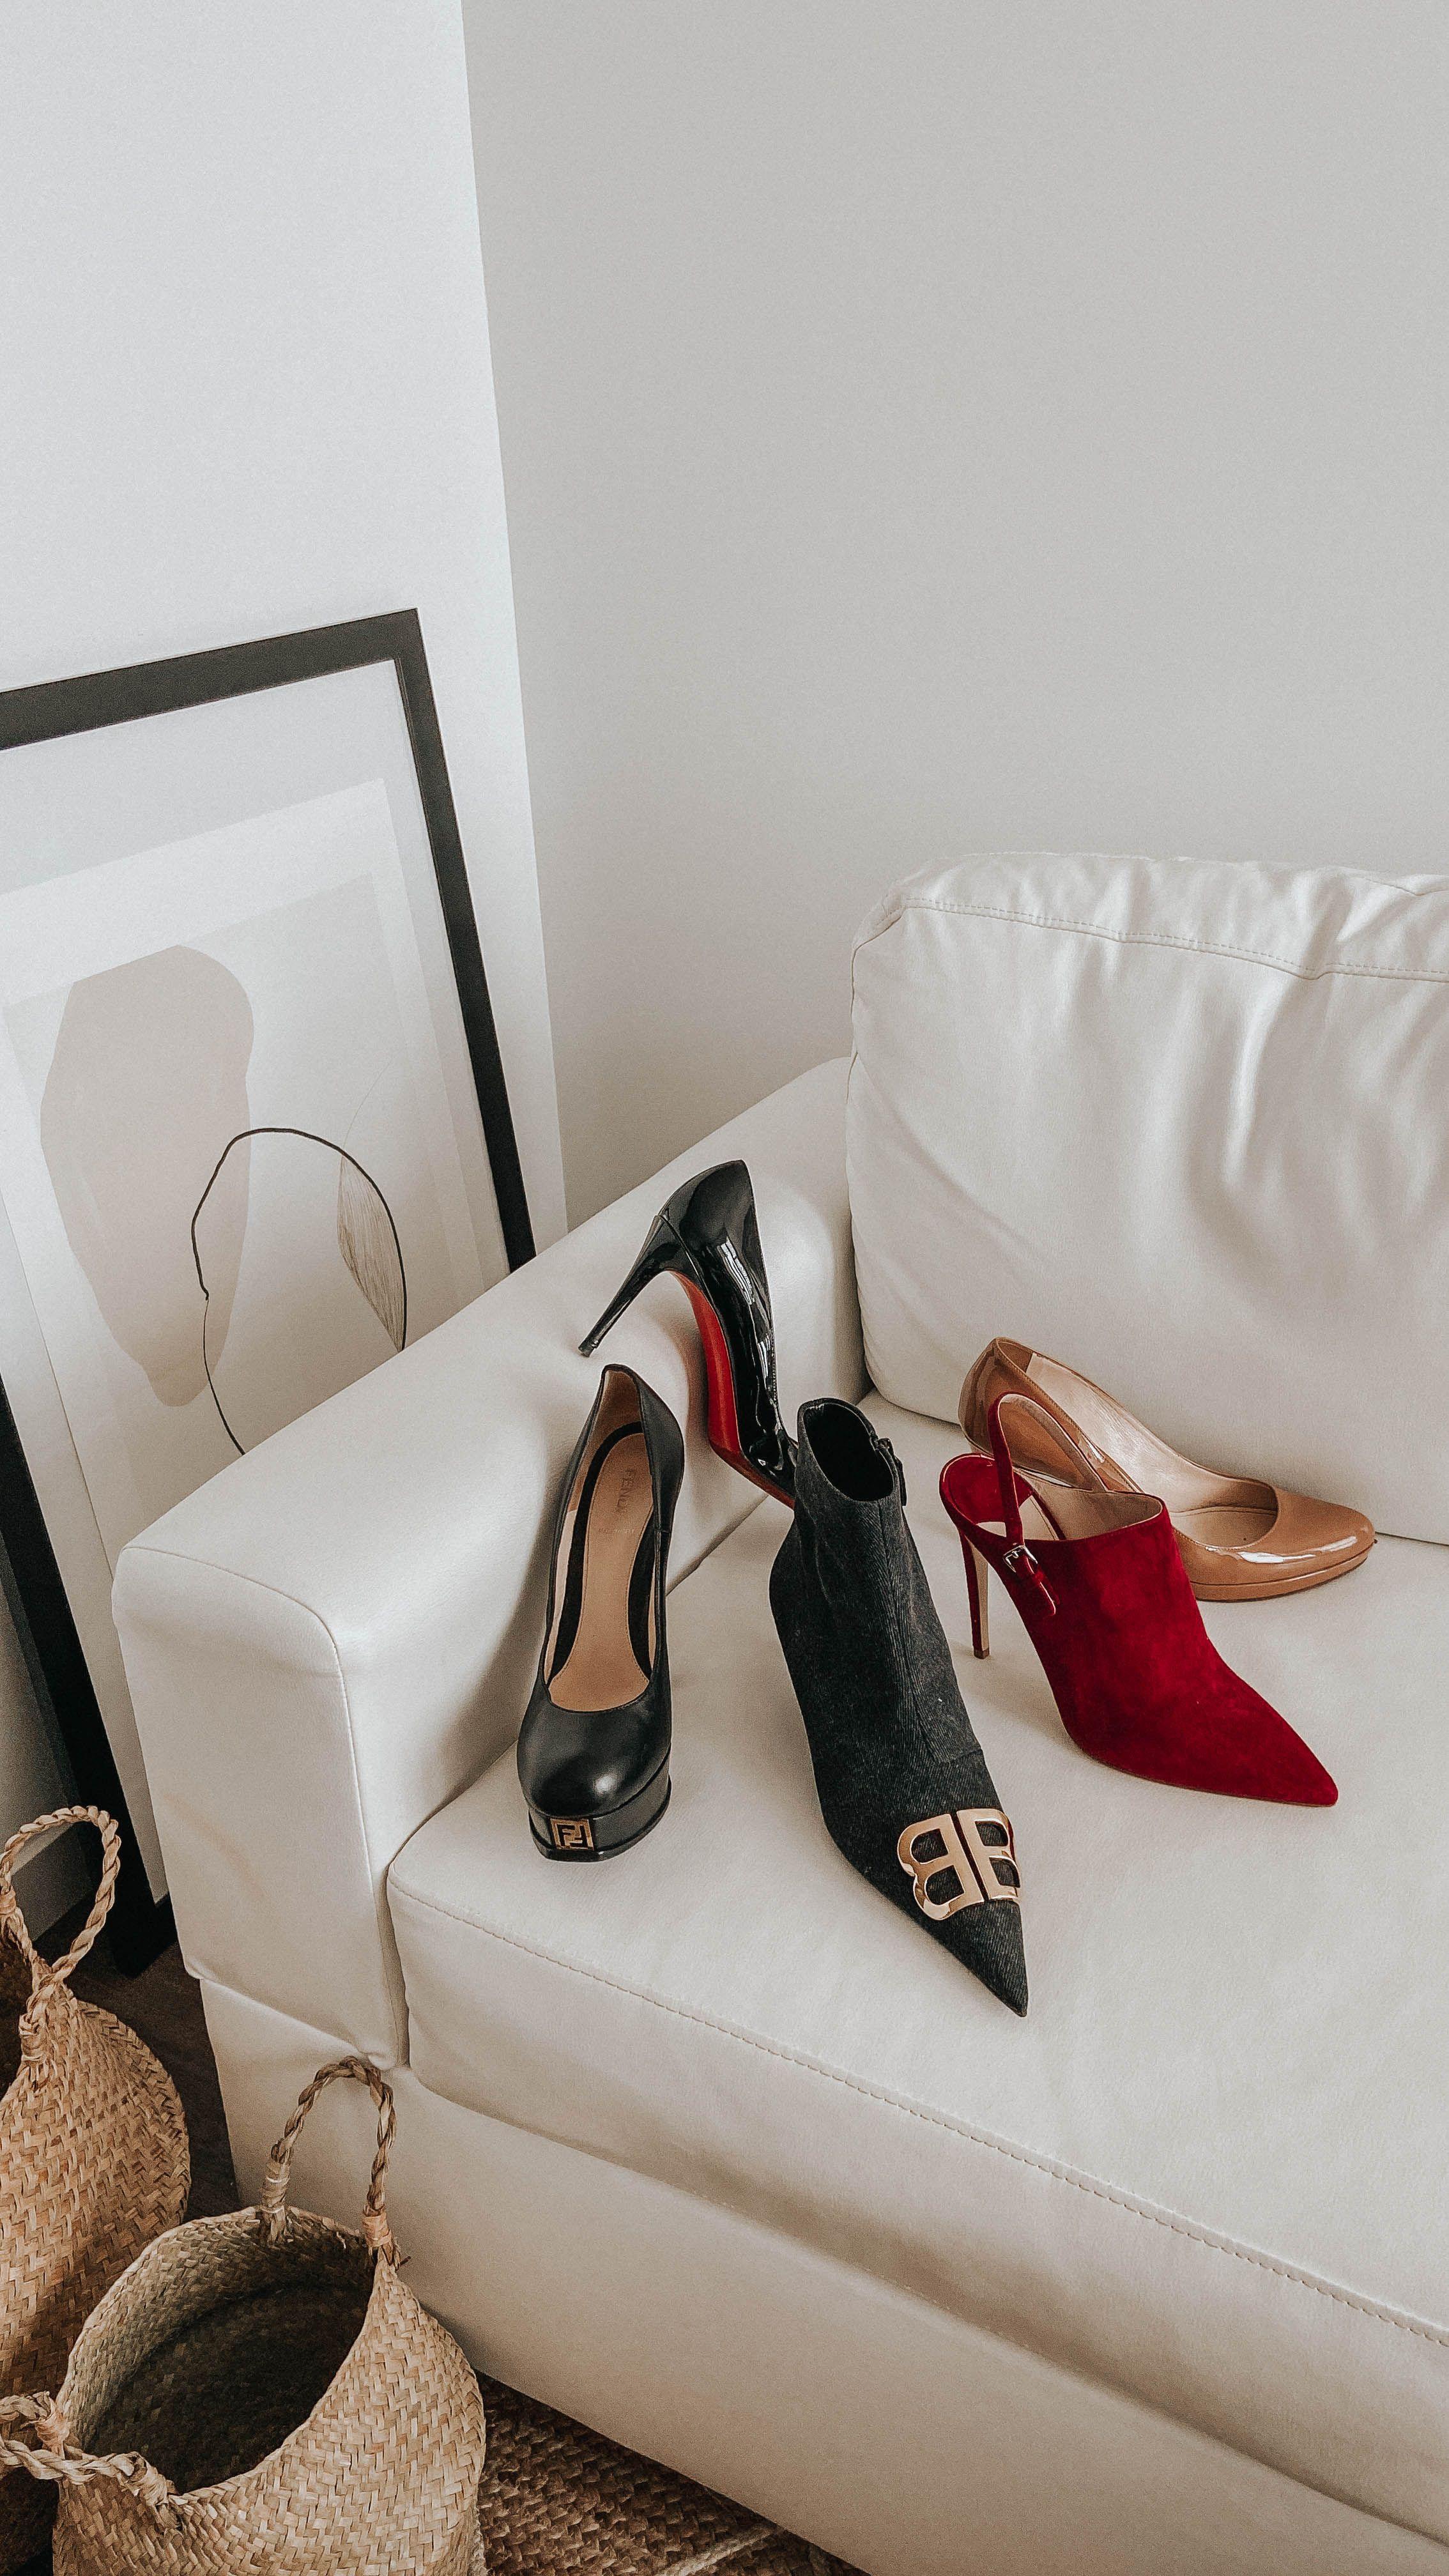 #shoes #heels #heelsaddict #shoegame #interior #interiordesignideas